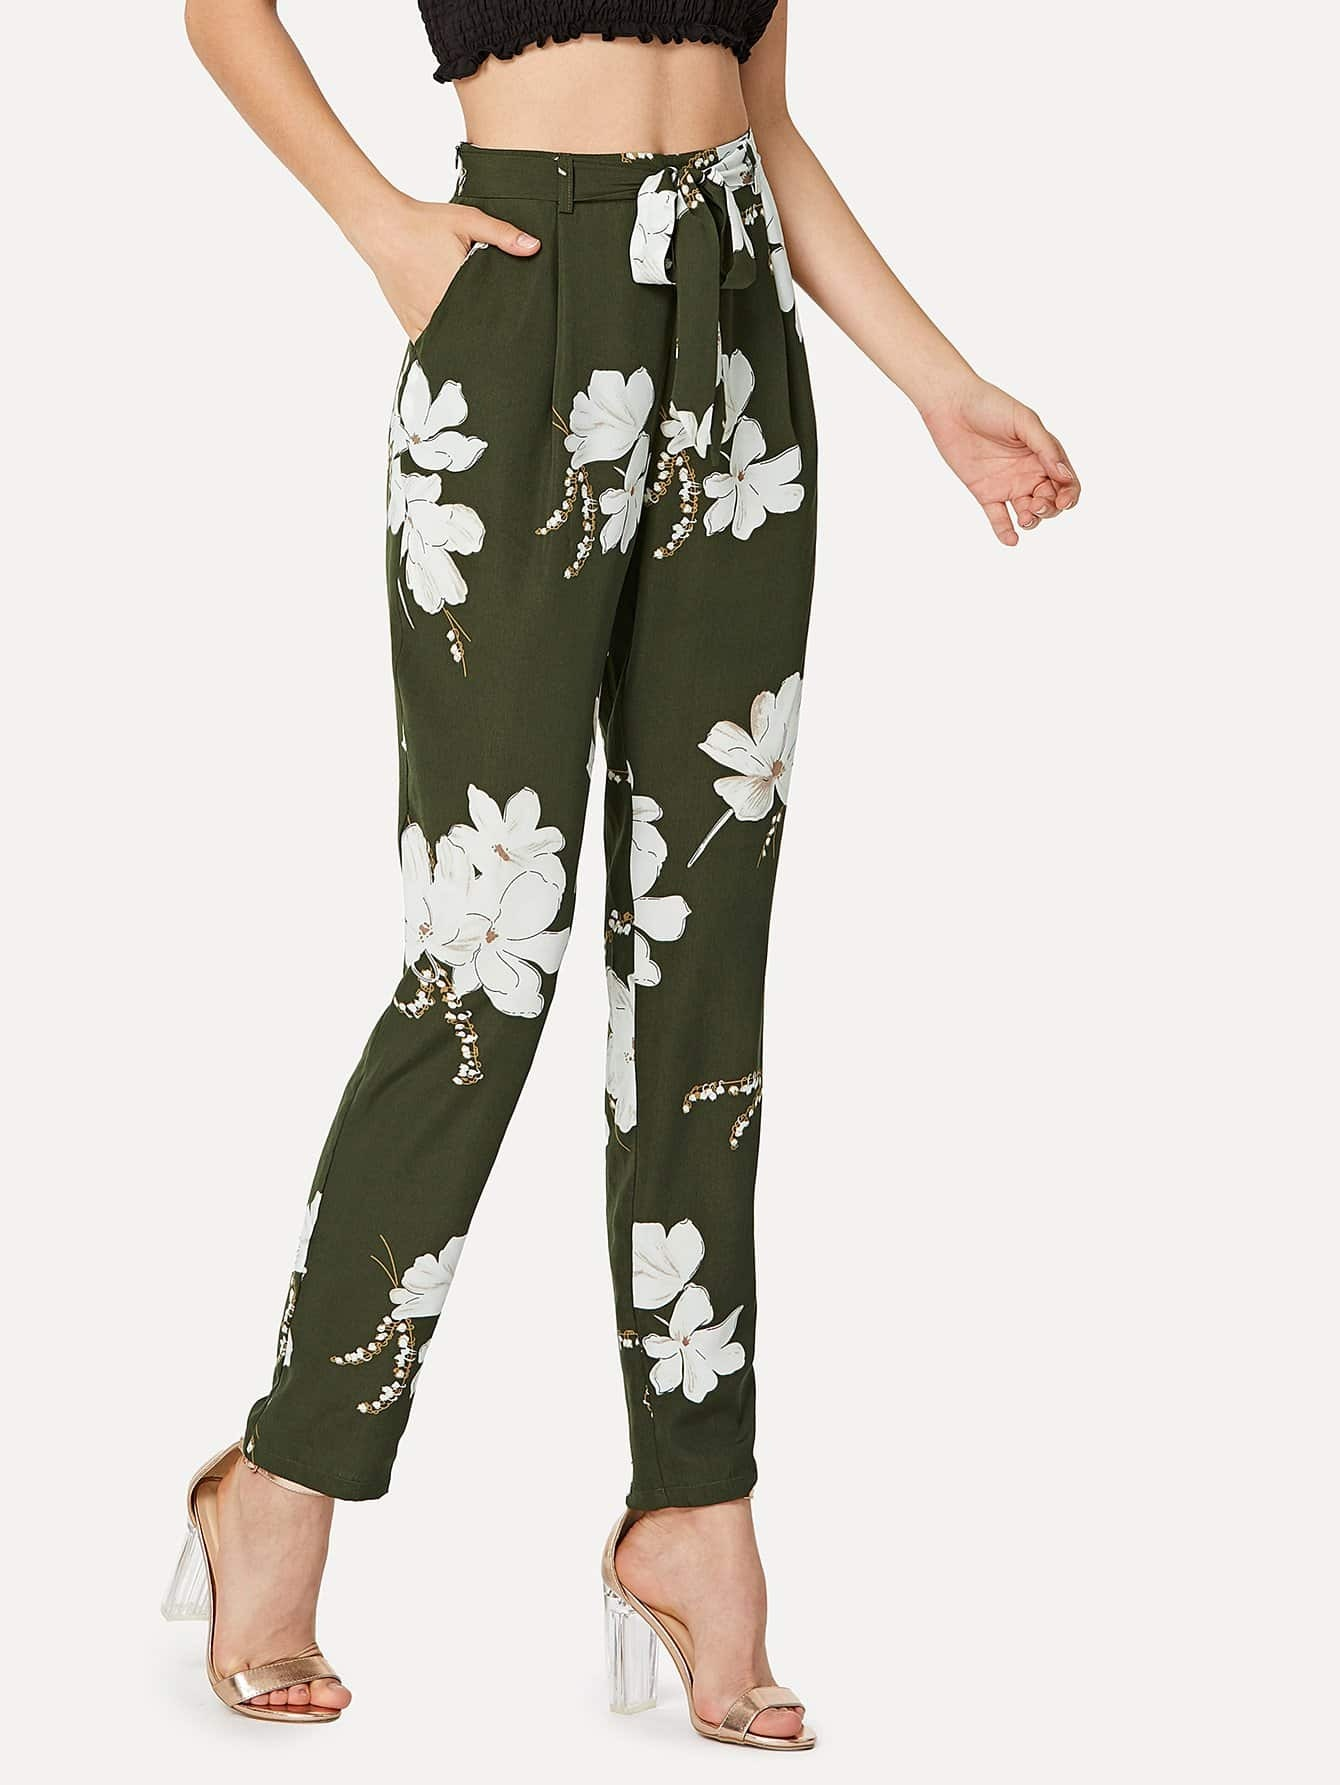 pantalon pliss fleuri avec n ud devant french shein sheinside. Black Bedroom Furniture Sets. Home Design Ideas